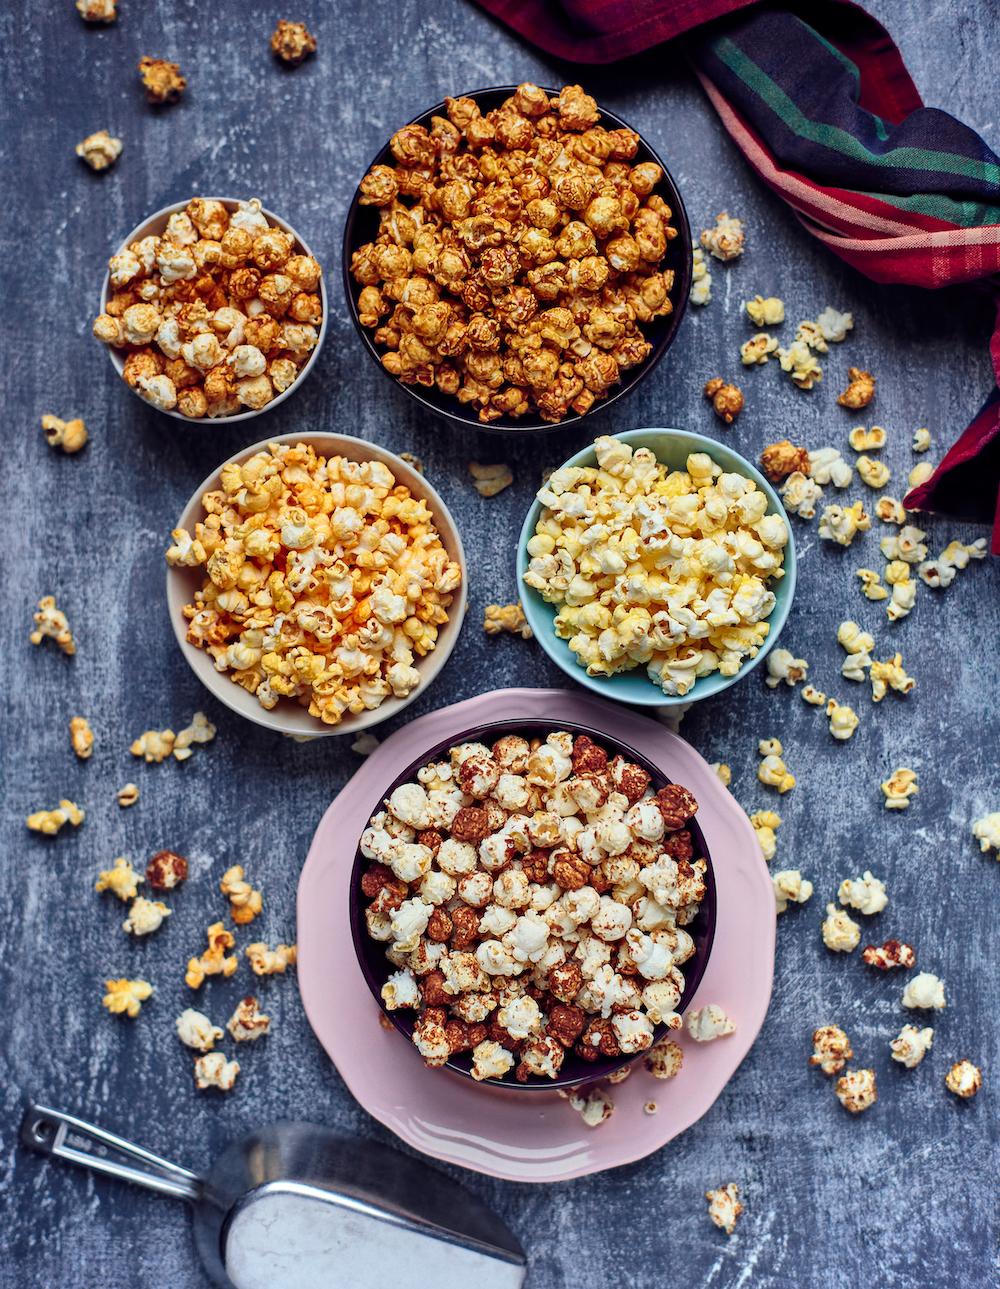 Popcorn ©Kovenkin shutterstock